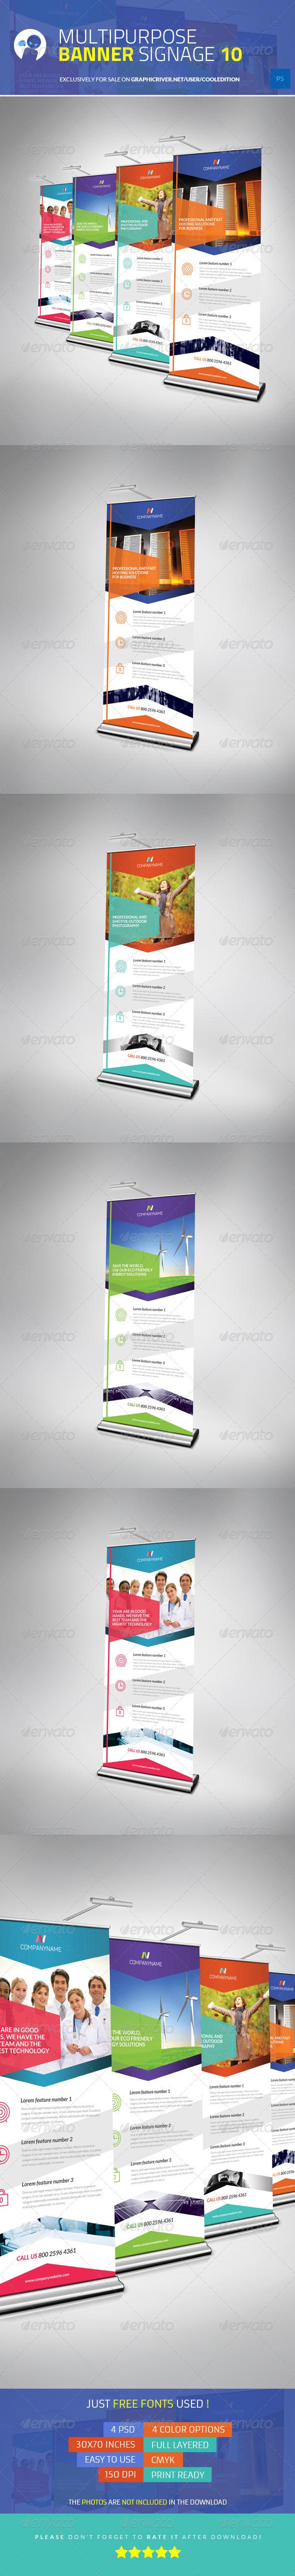 Multipurpose Banner Signage 10 - Signage Print Templates